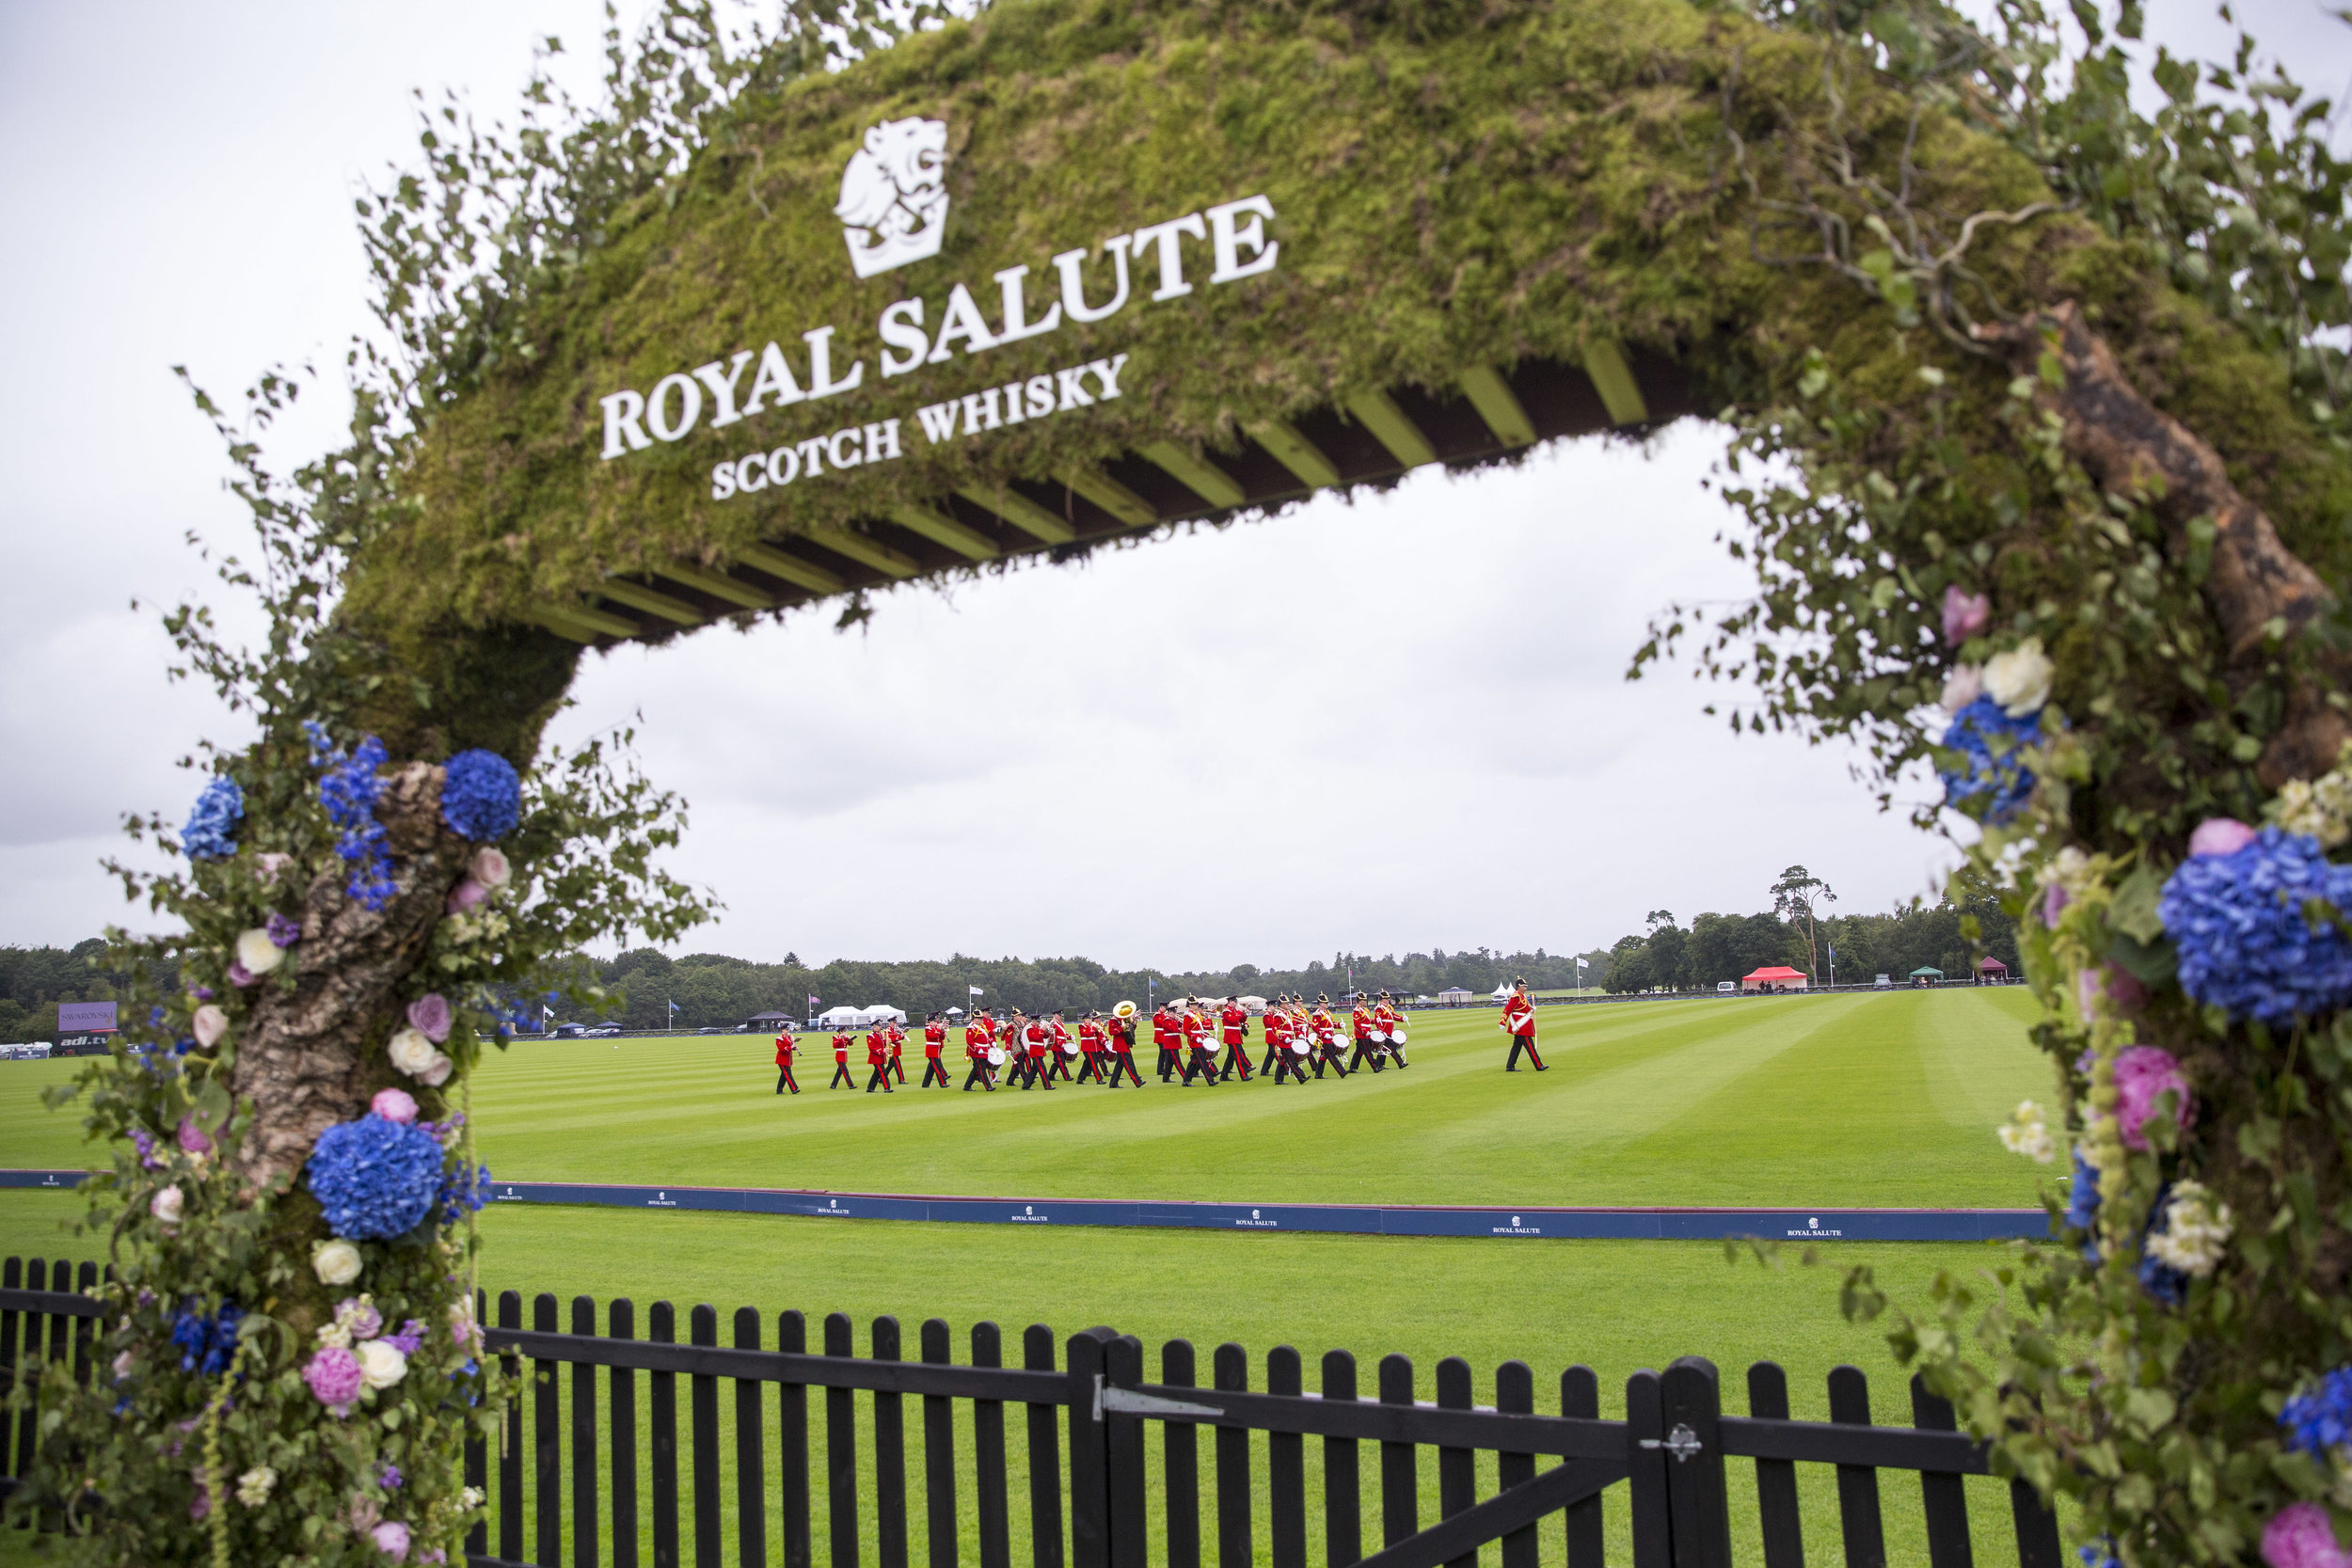 The Royal Salute Coronation Cup